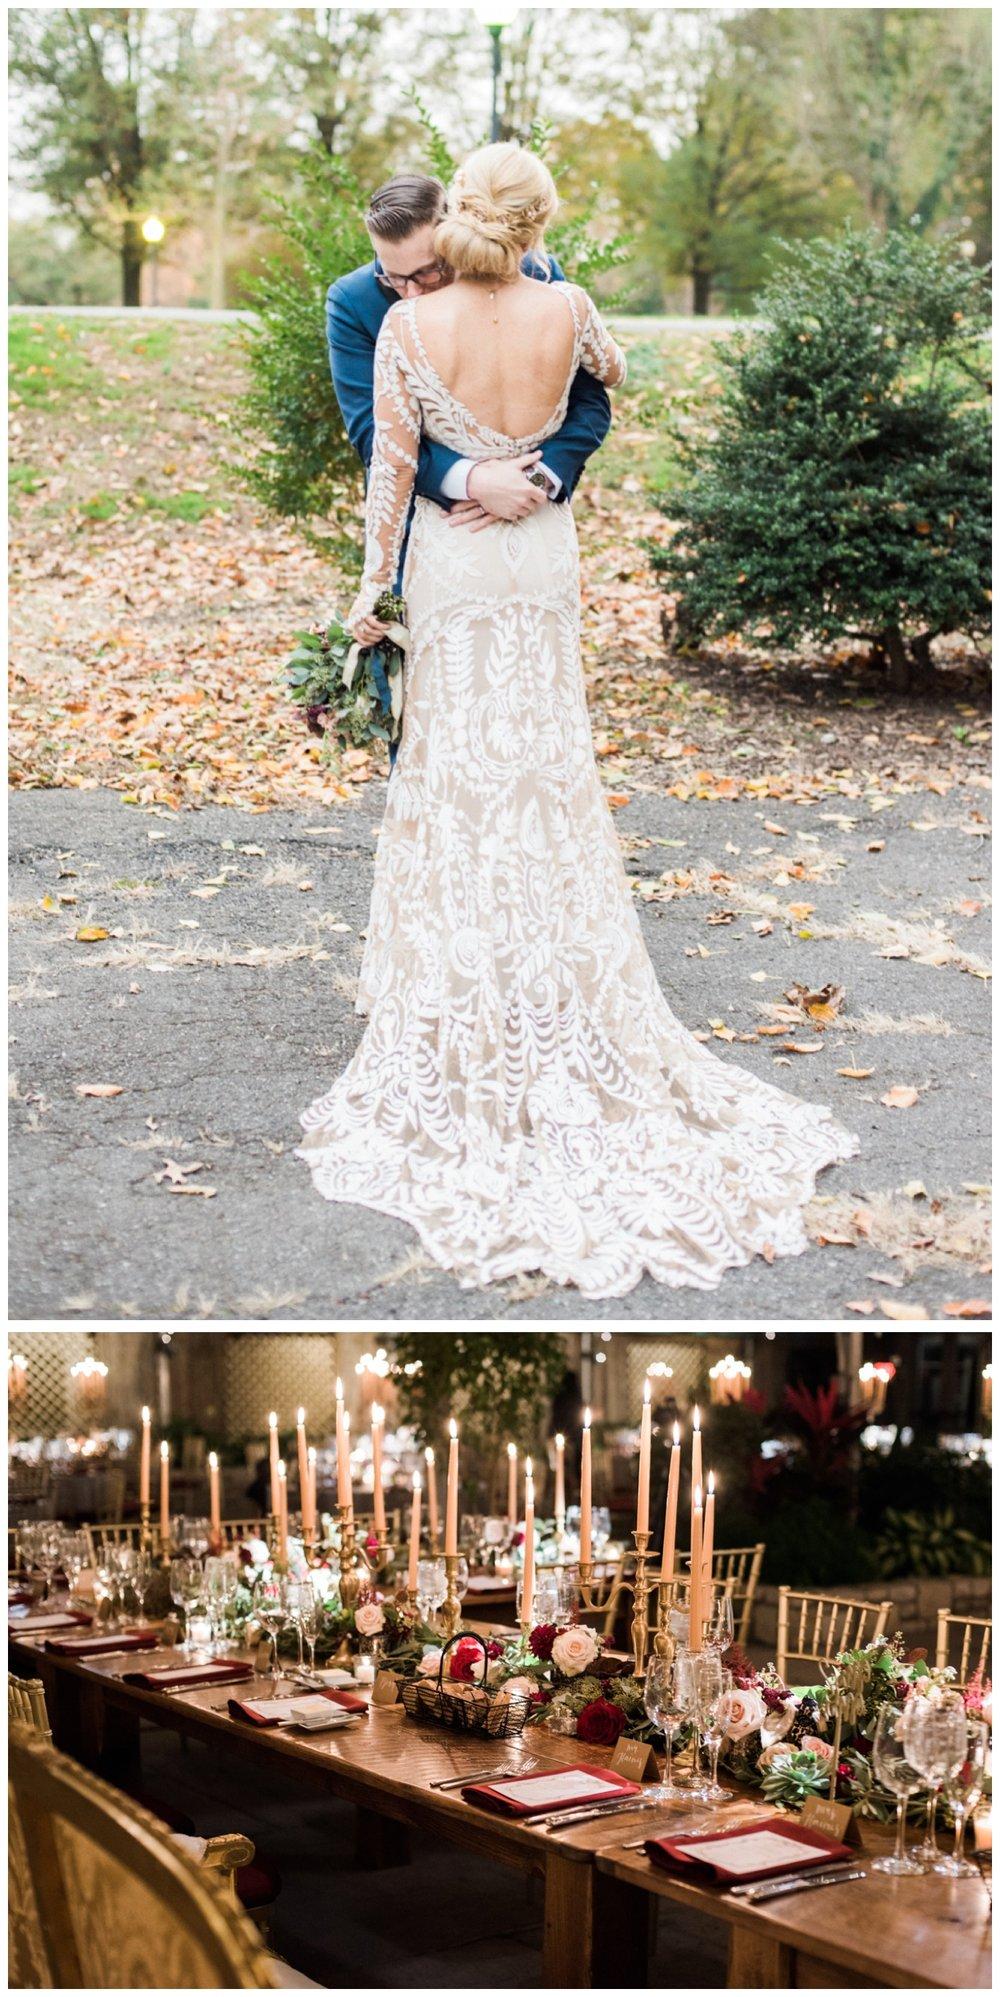 Lush fall wedding at the Fairmount Horticulture Center in Philadelphia Pennsylvania by fine art wedding photographer Lissa Ryan Photography